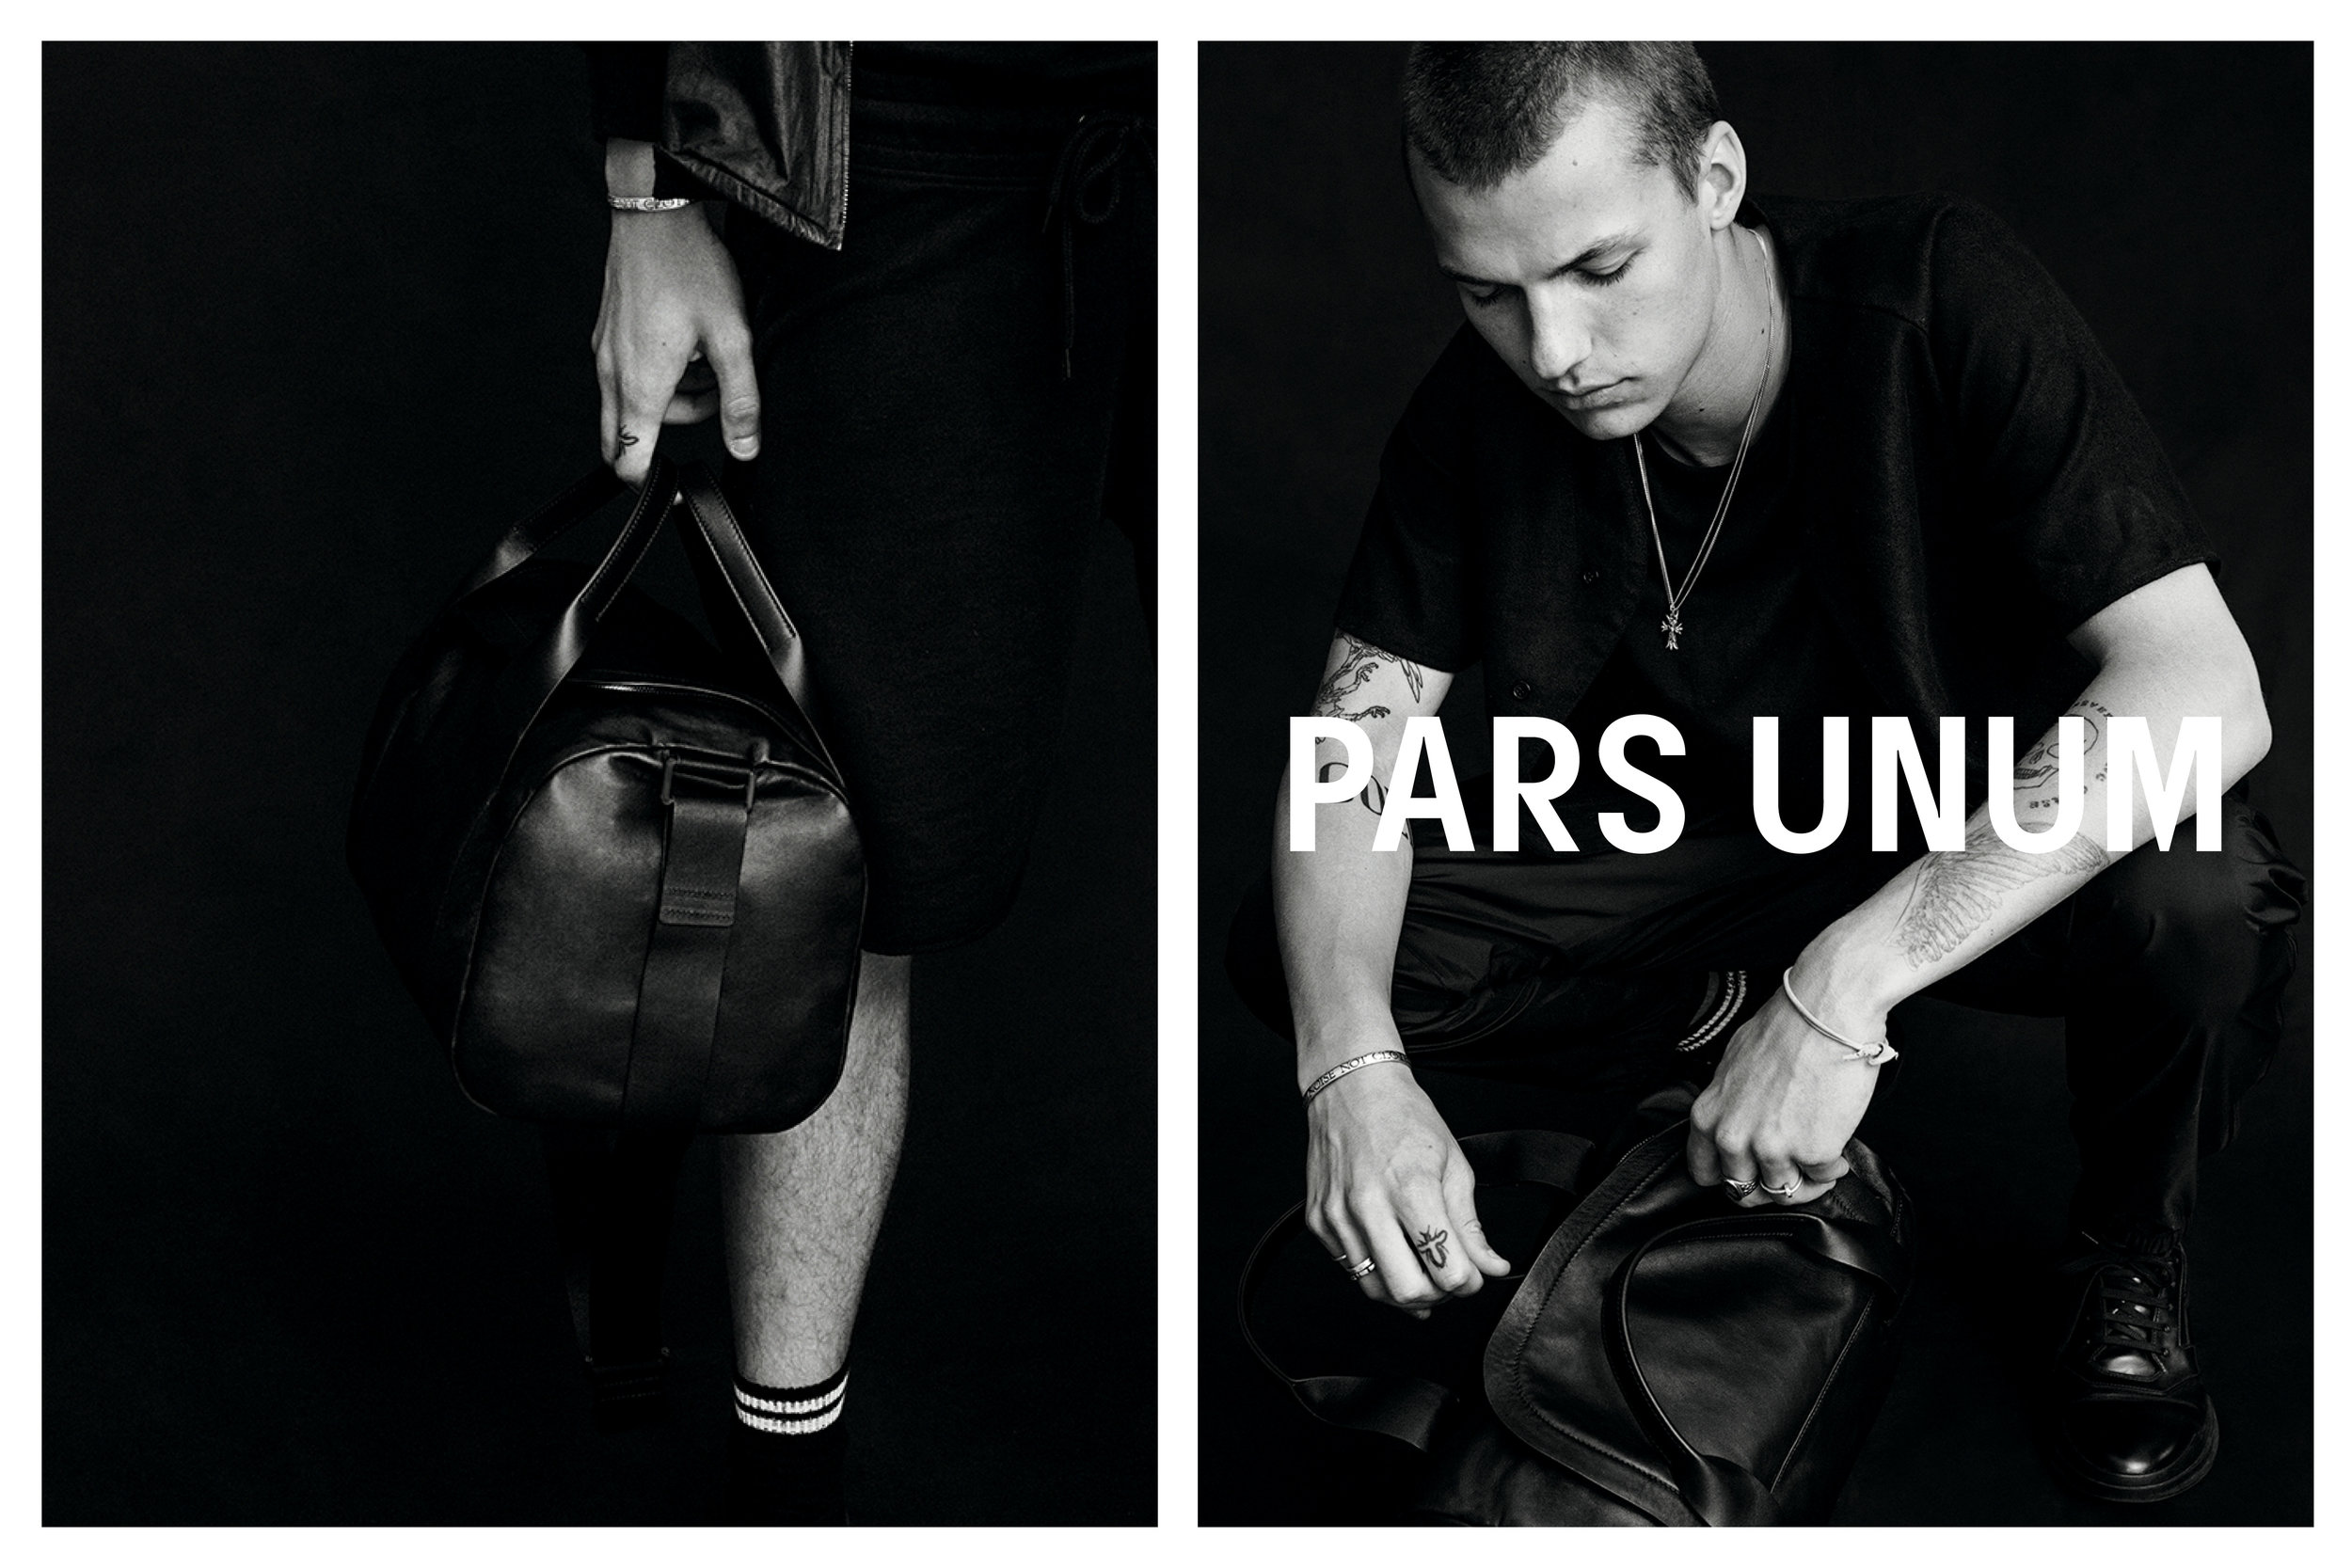 PARS_UNUM_Lookbook10.jpg